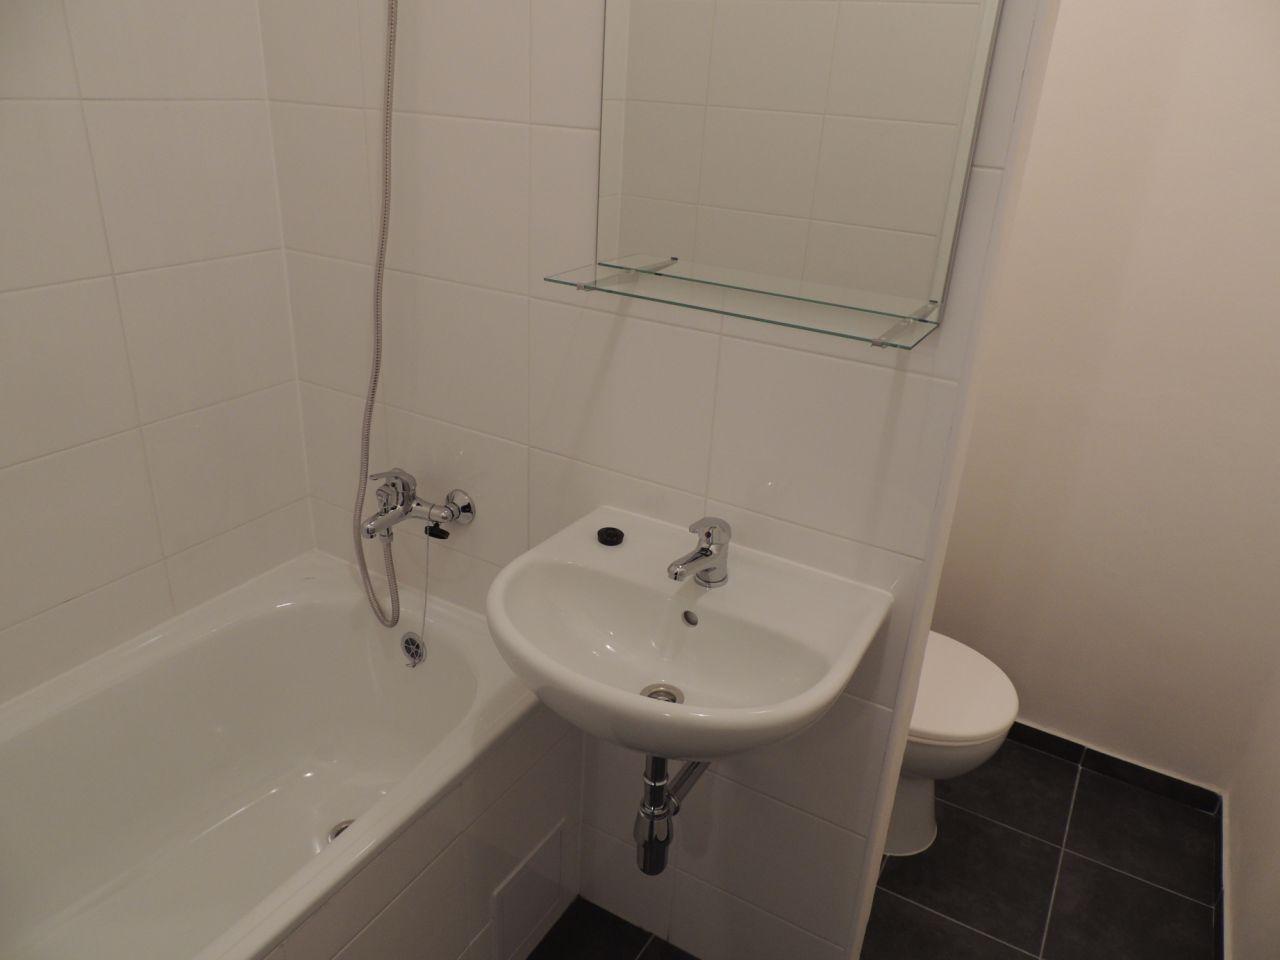 Pronájem bytu 2+1 44 m2, ul. Jana Maluchy 209/63, Ostrava - Dubina